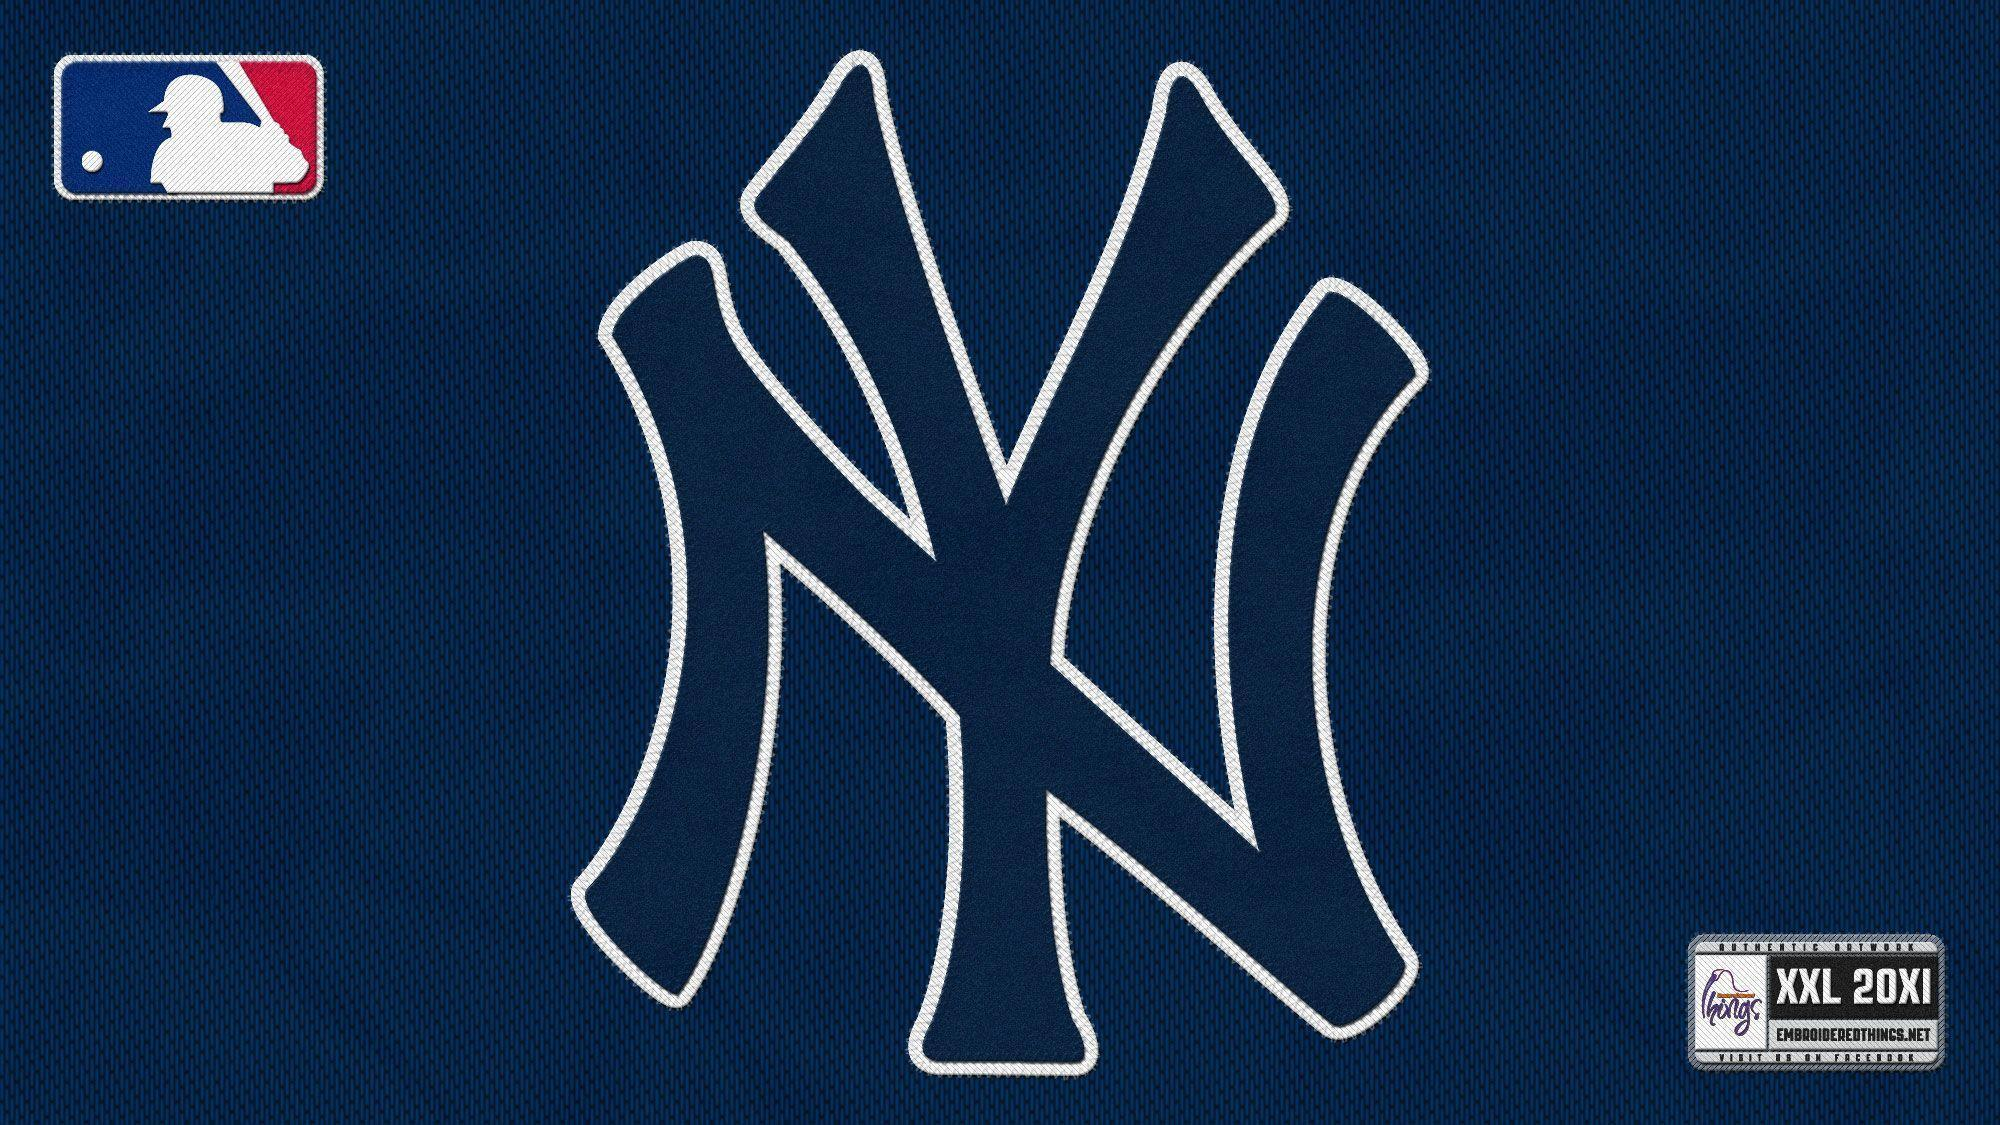 New York Yankees Cool Wallpaper | Free Download Wallpaper from .